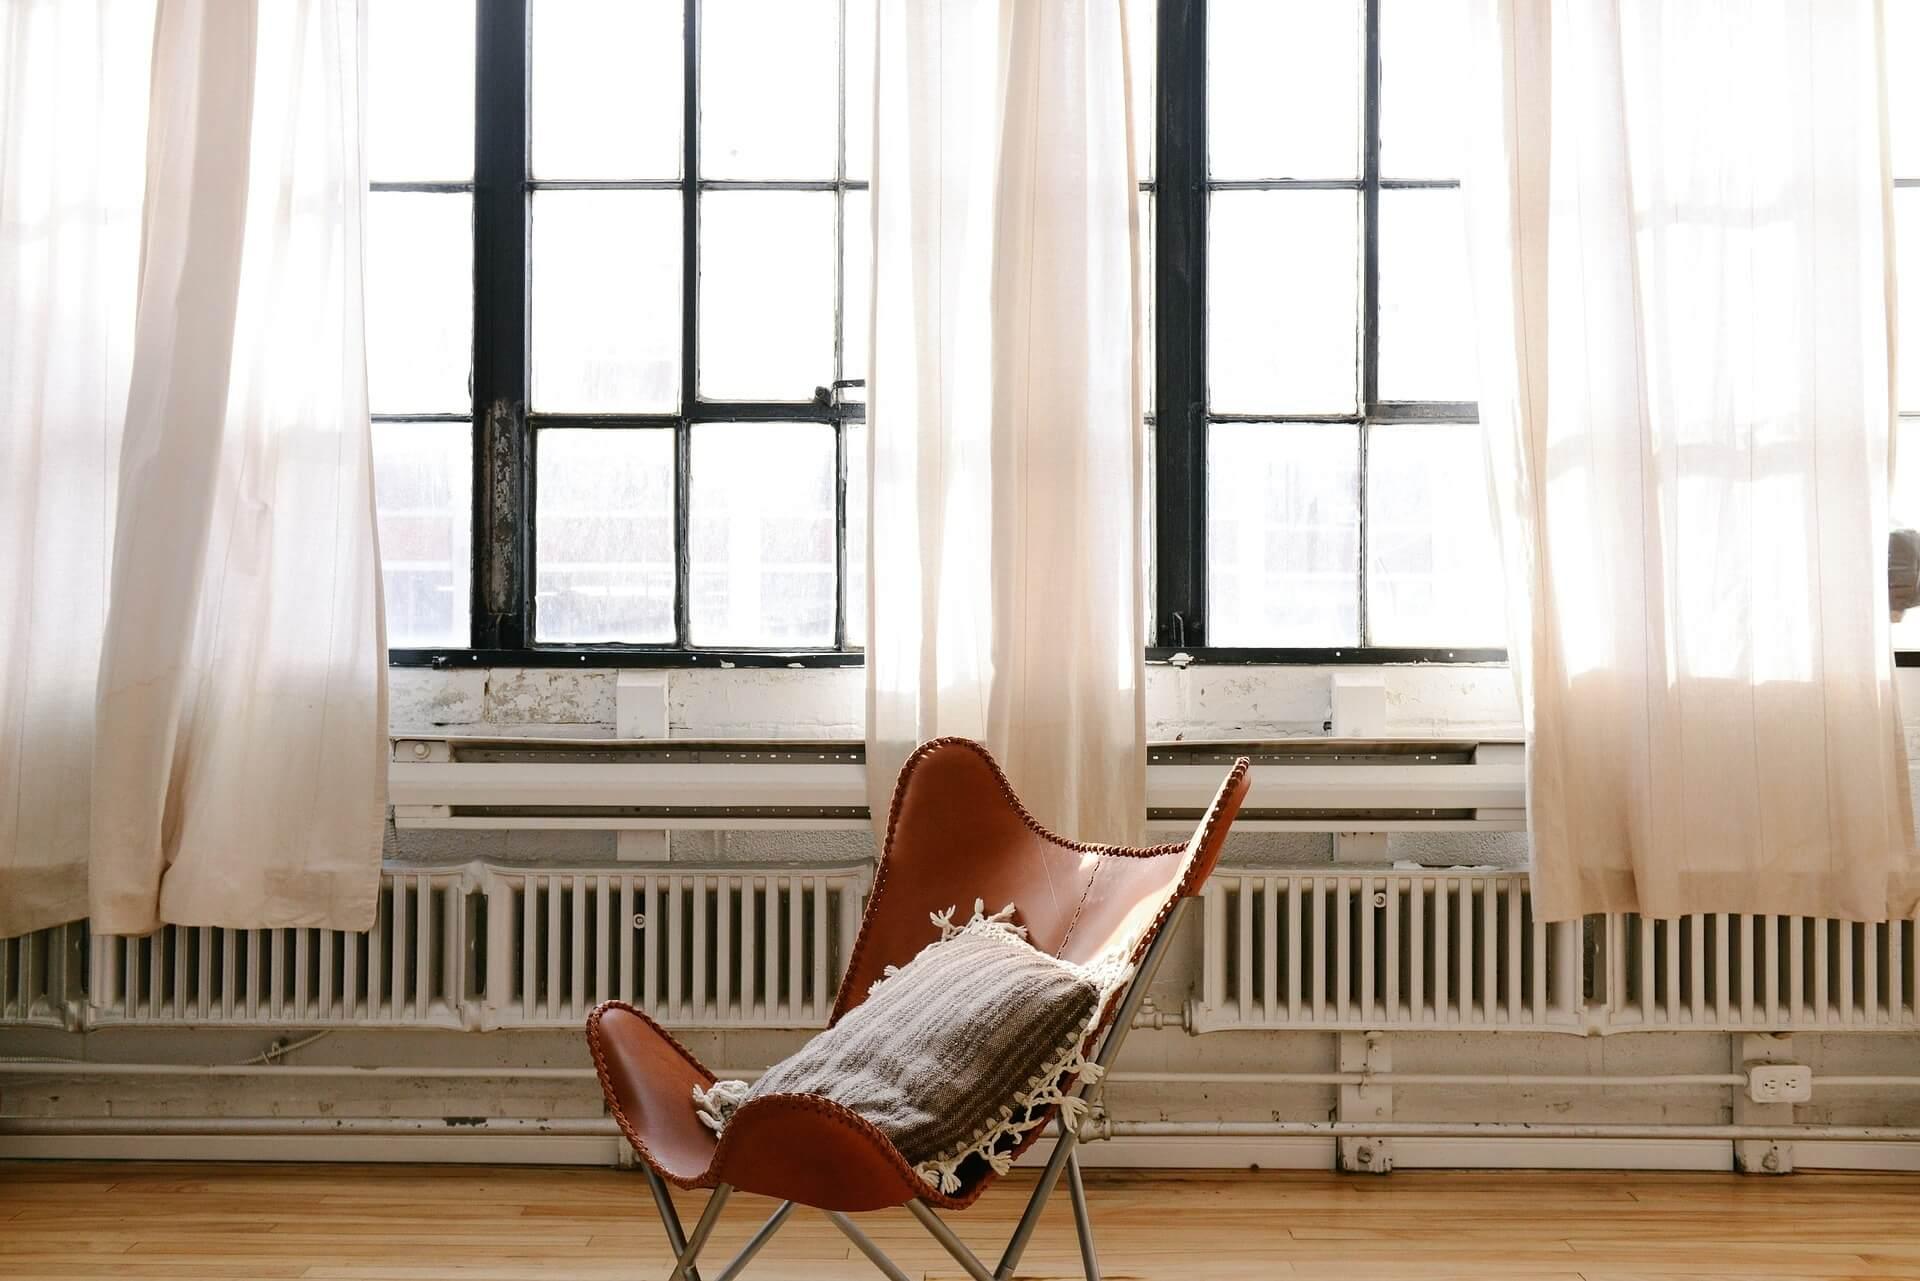 Radiator Slaapkamer Meubels : Kid s room radiator cover slaapkamer slaapkamer